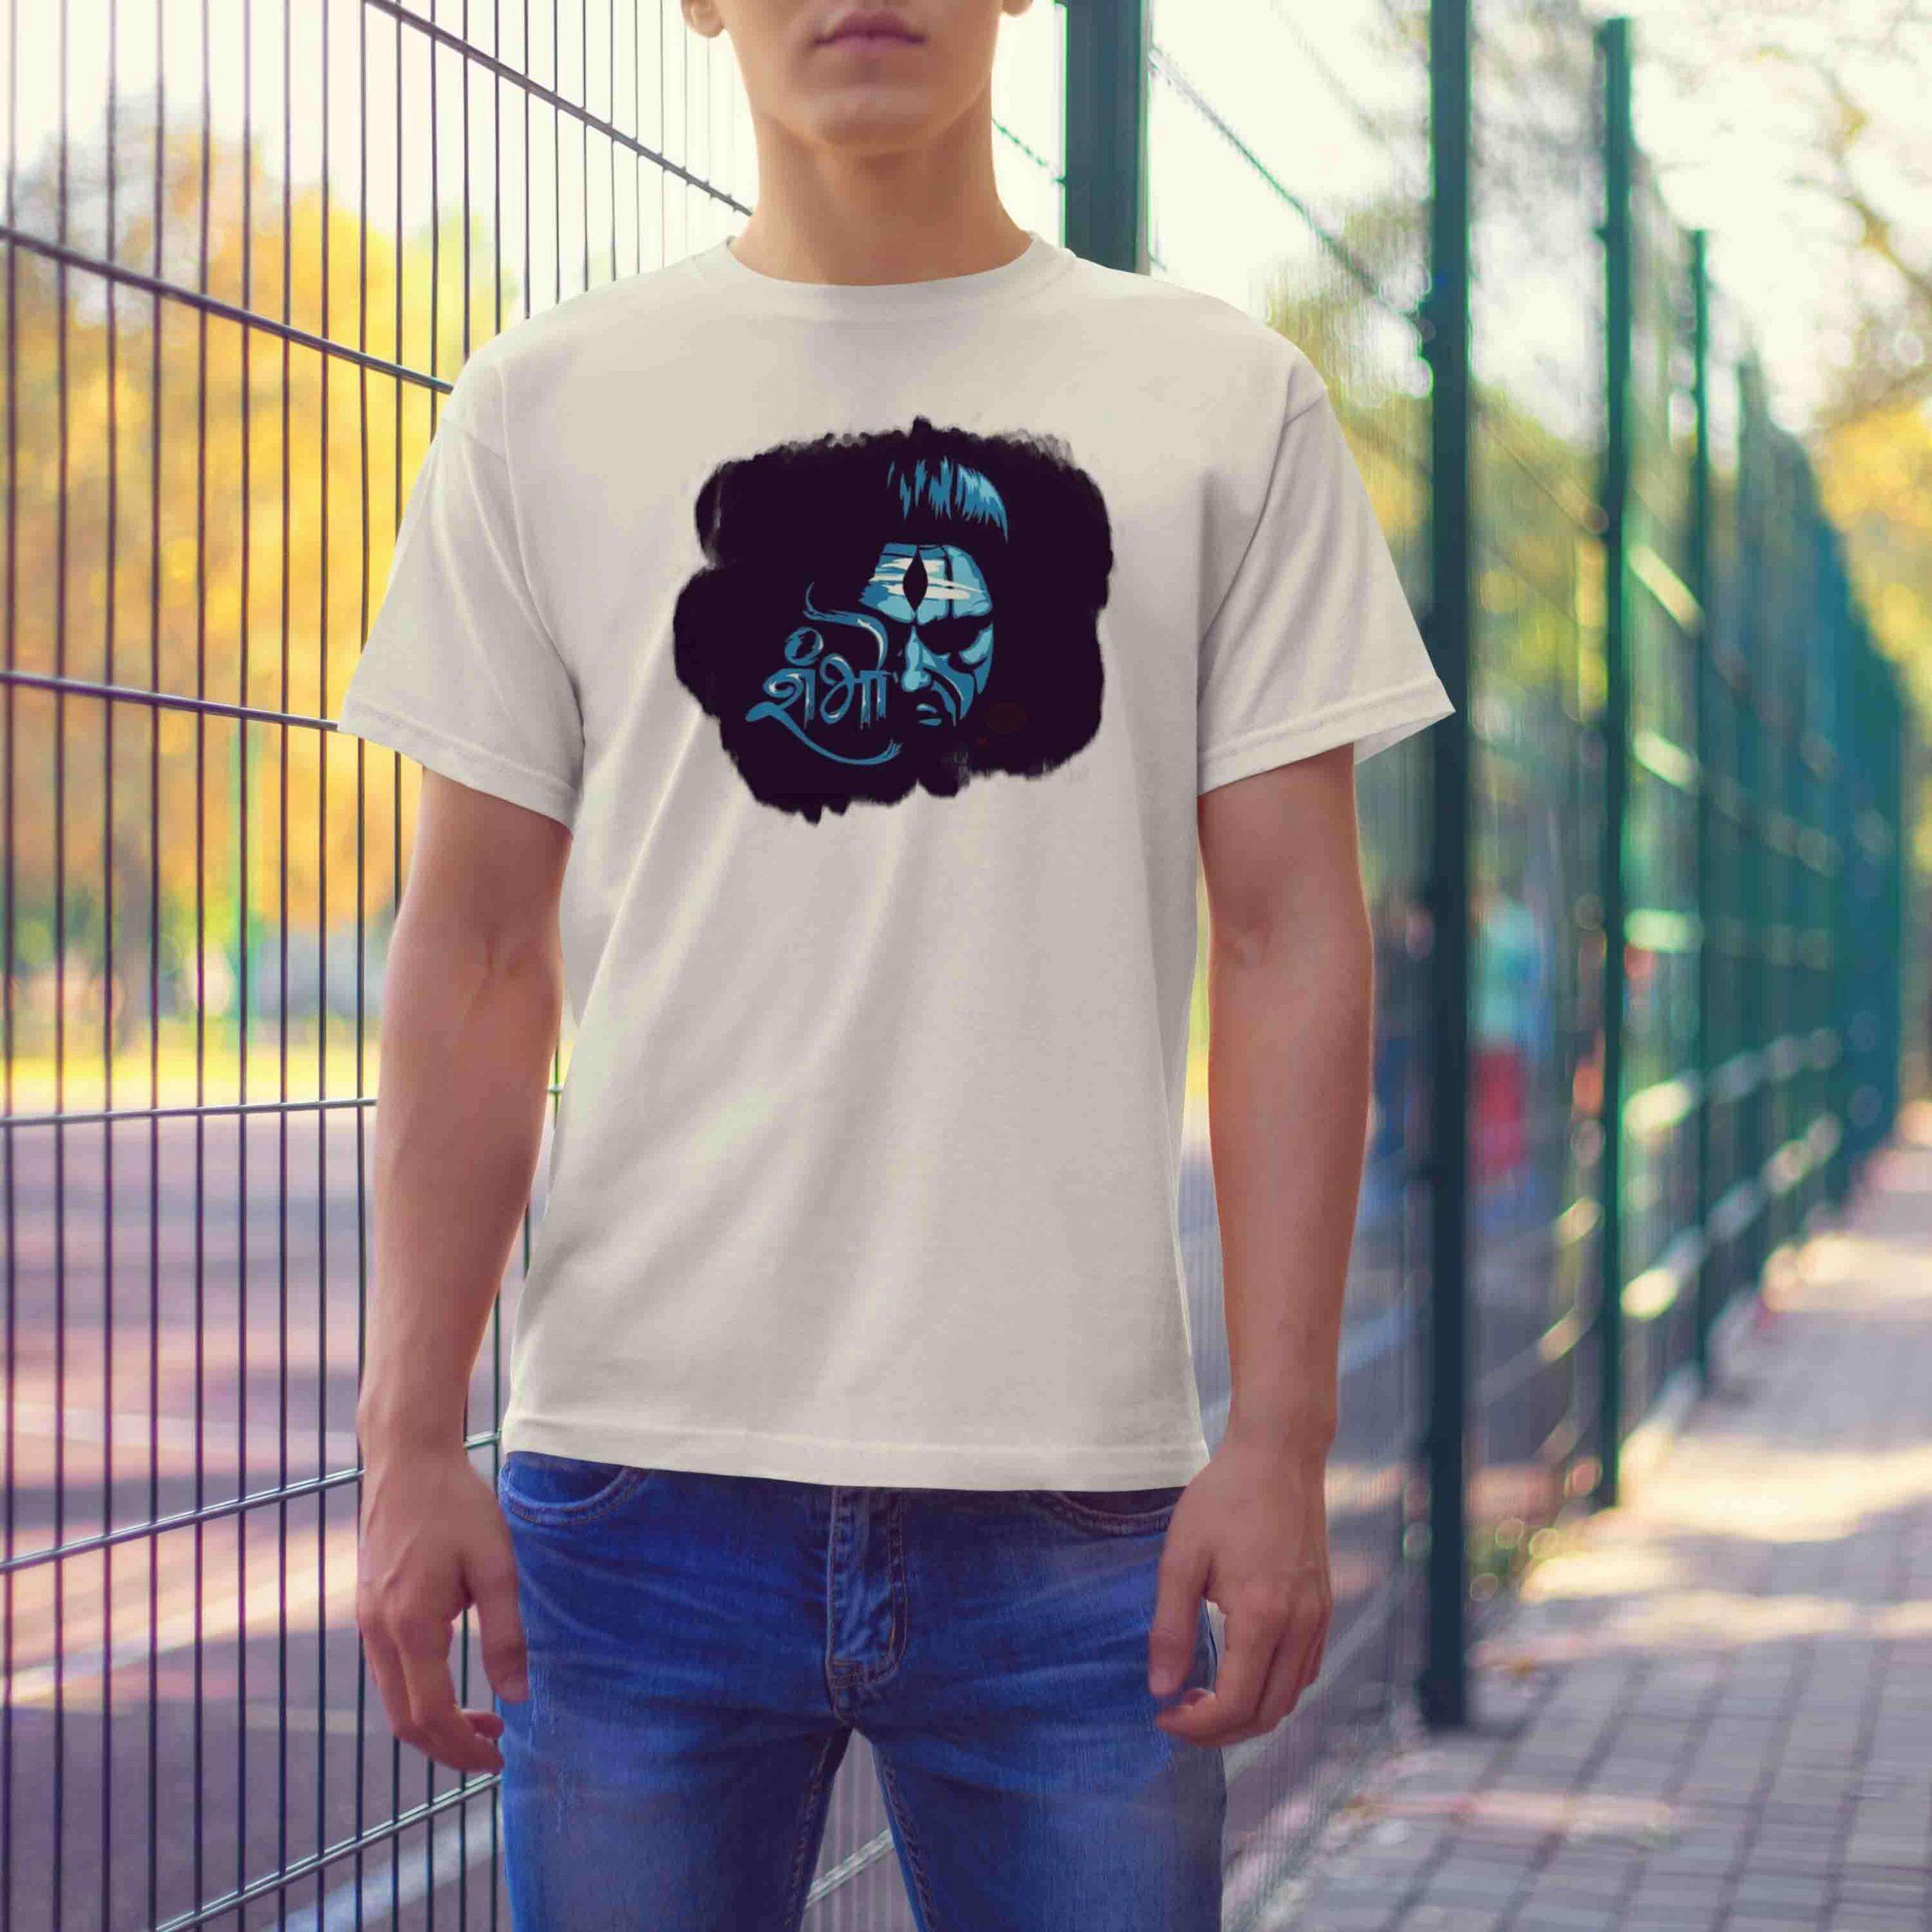 Shiv shambhu black background printed white t-shirt